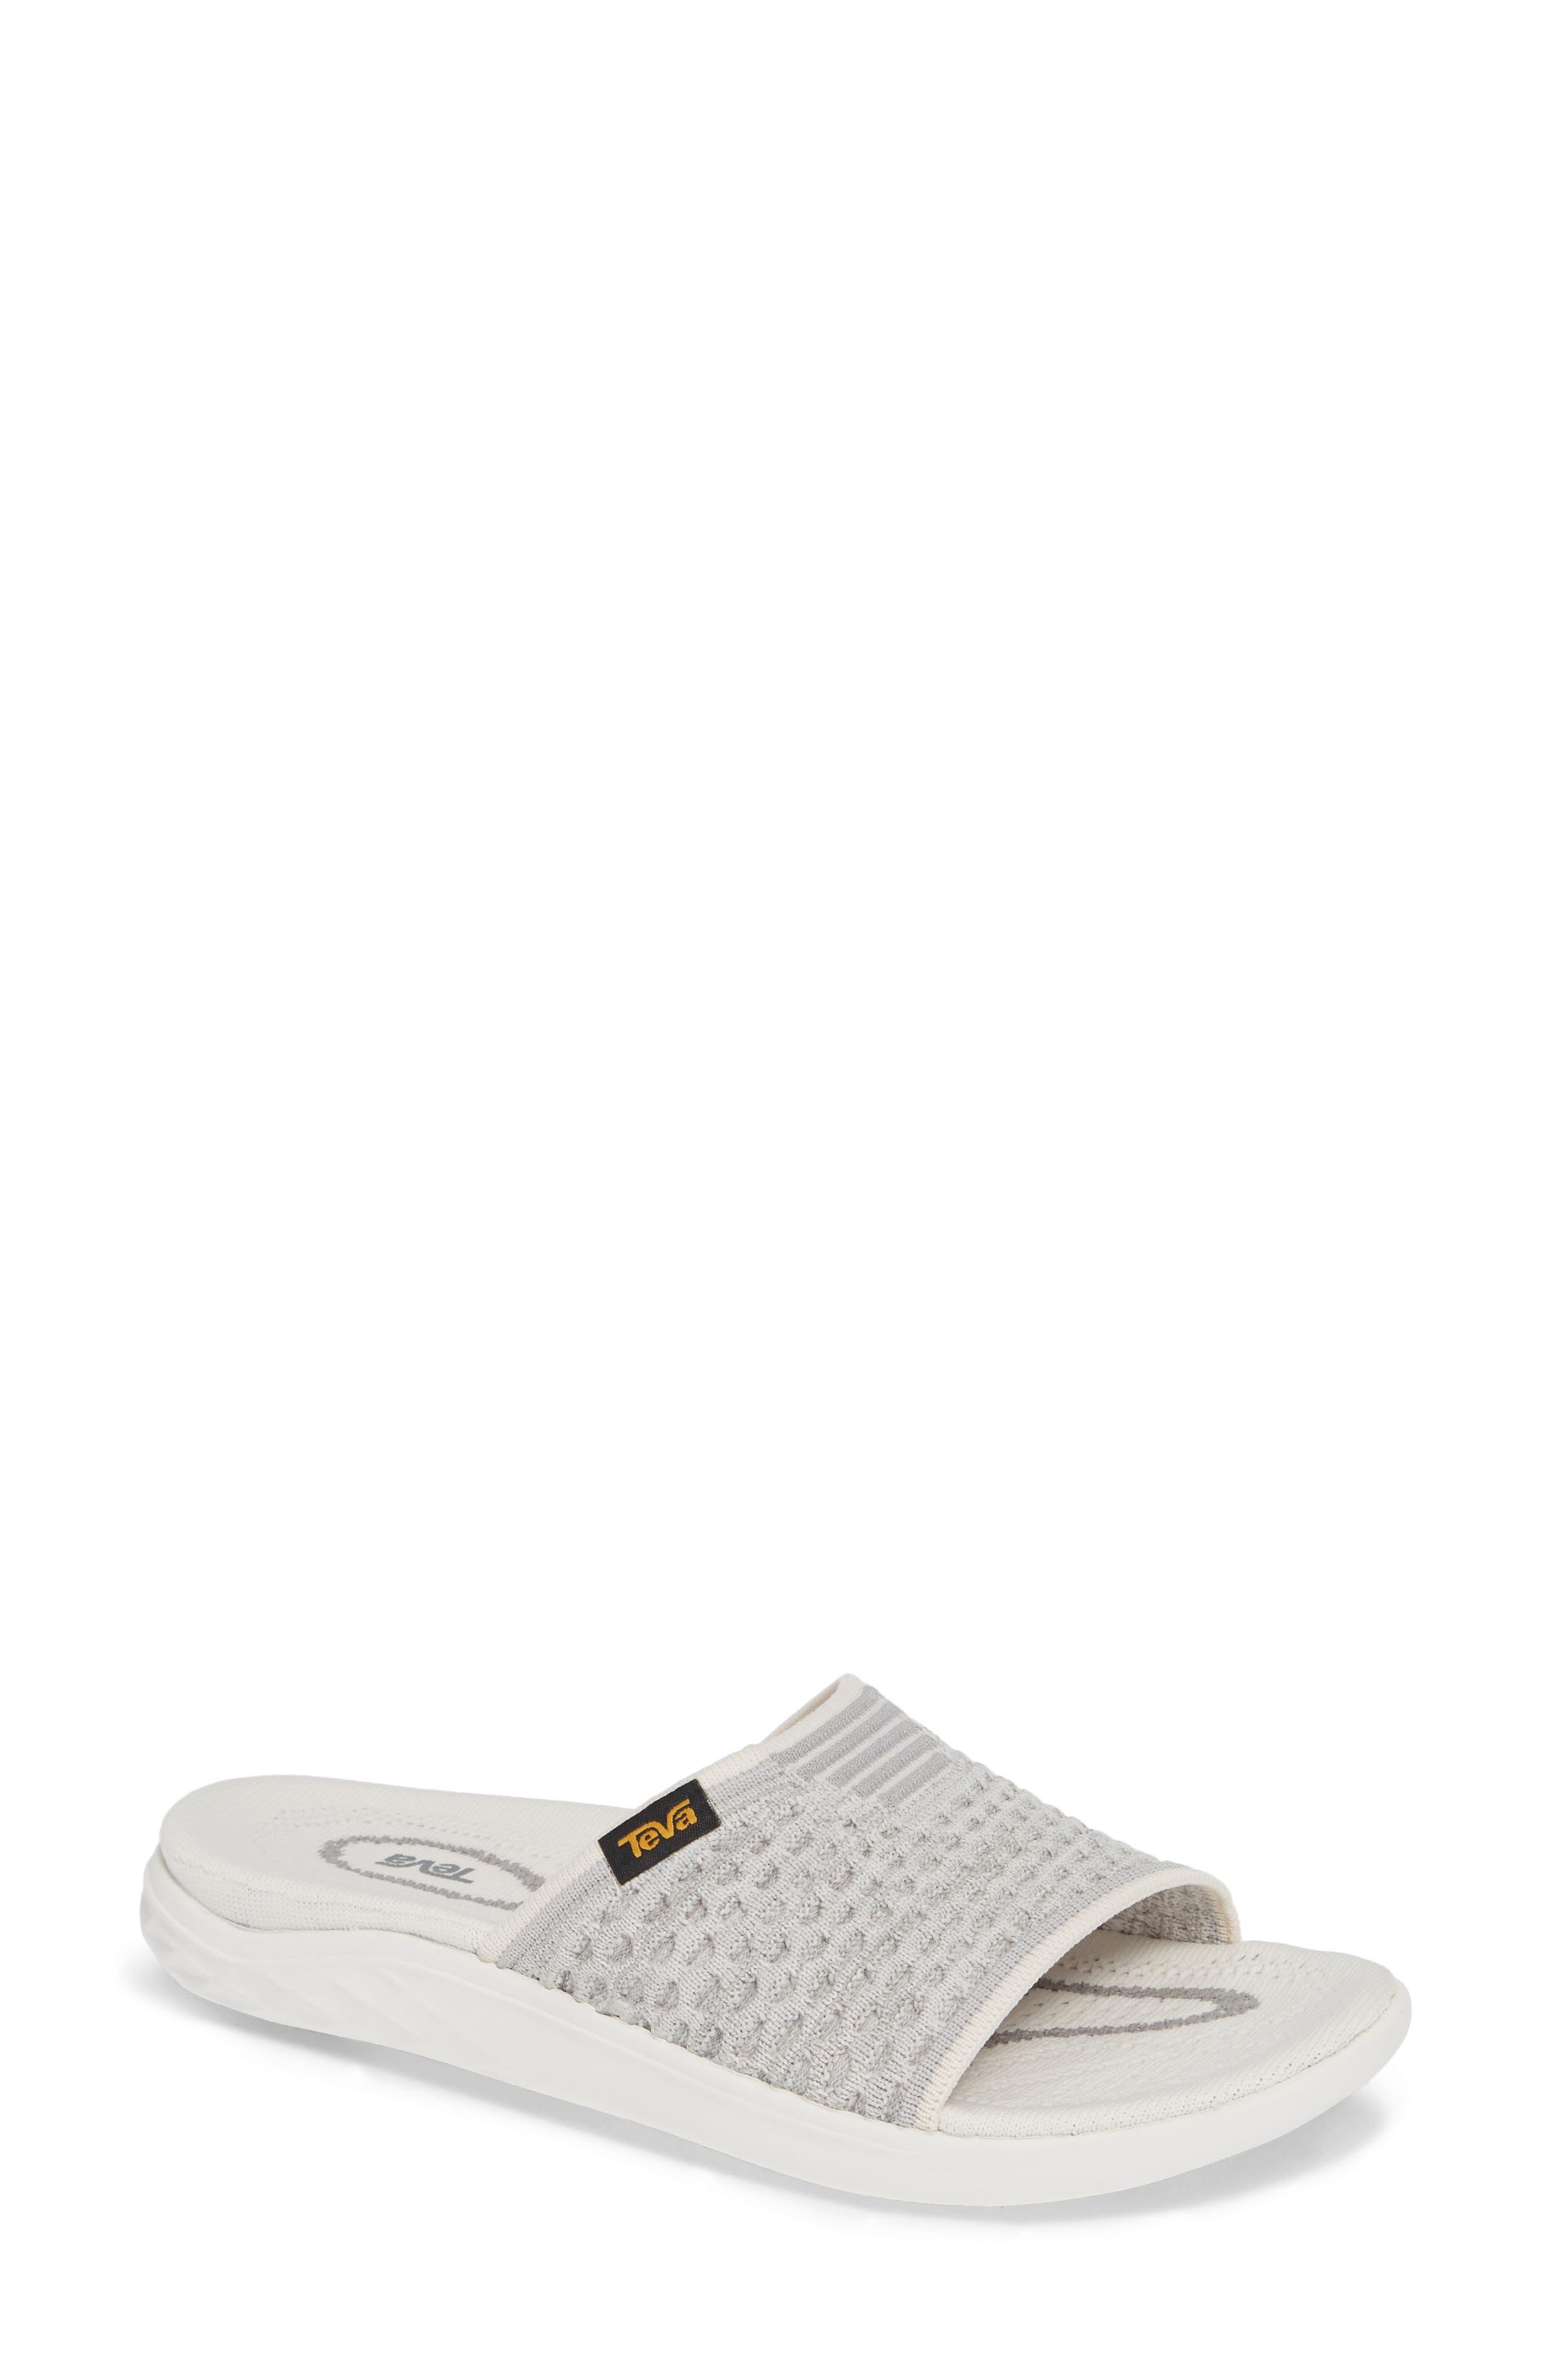 Terra Float 2 Knit Slide Sandal,                         Main,                         color, BRIGHT WHITE FABRIC